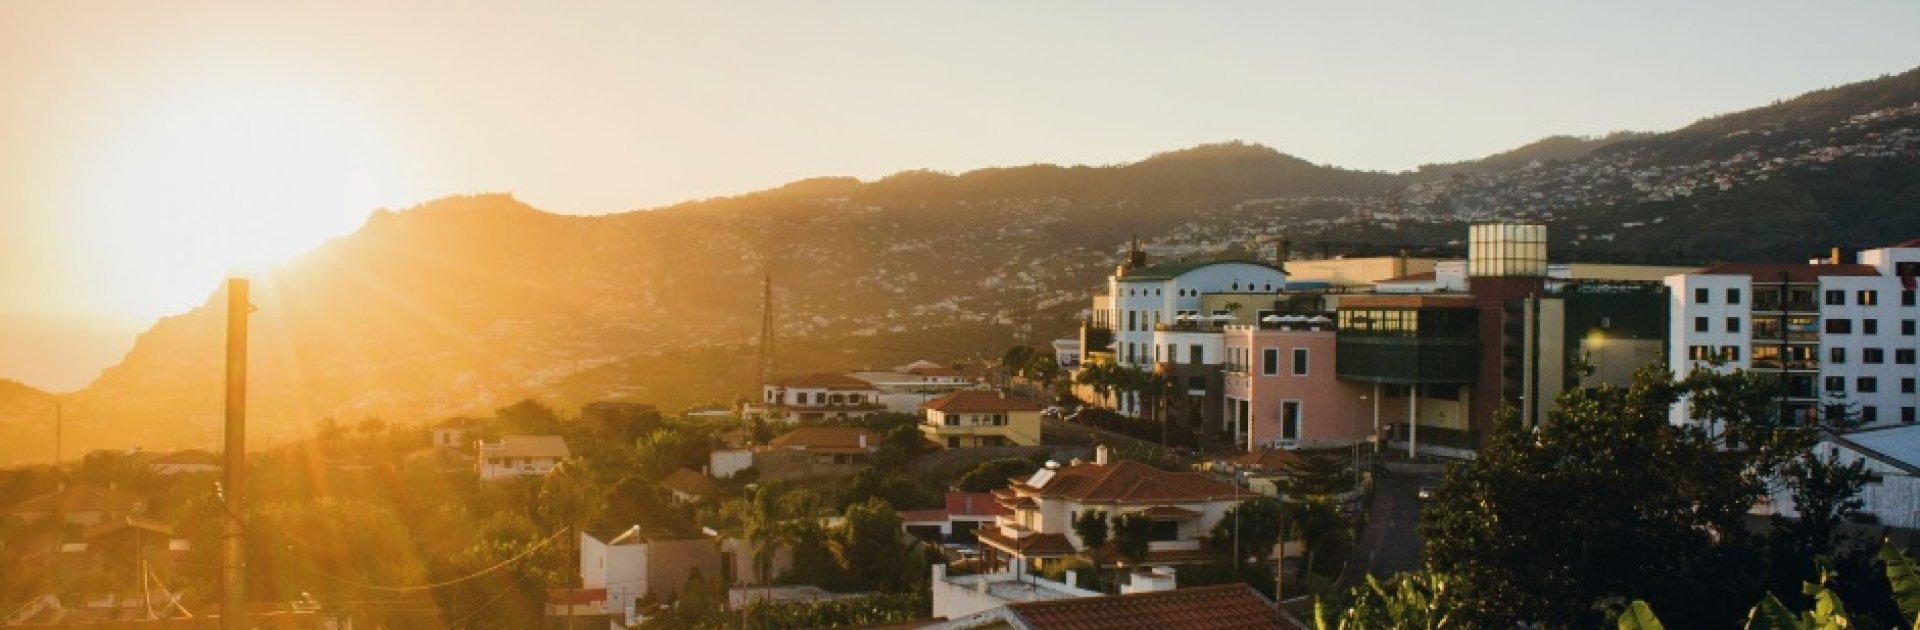 Ferienhäuser in Portugal